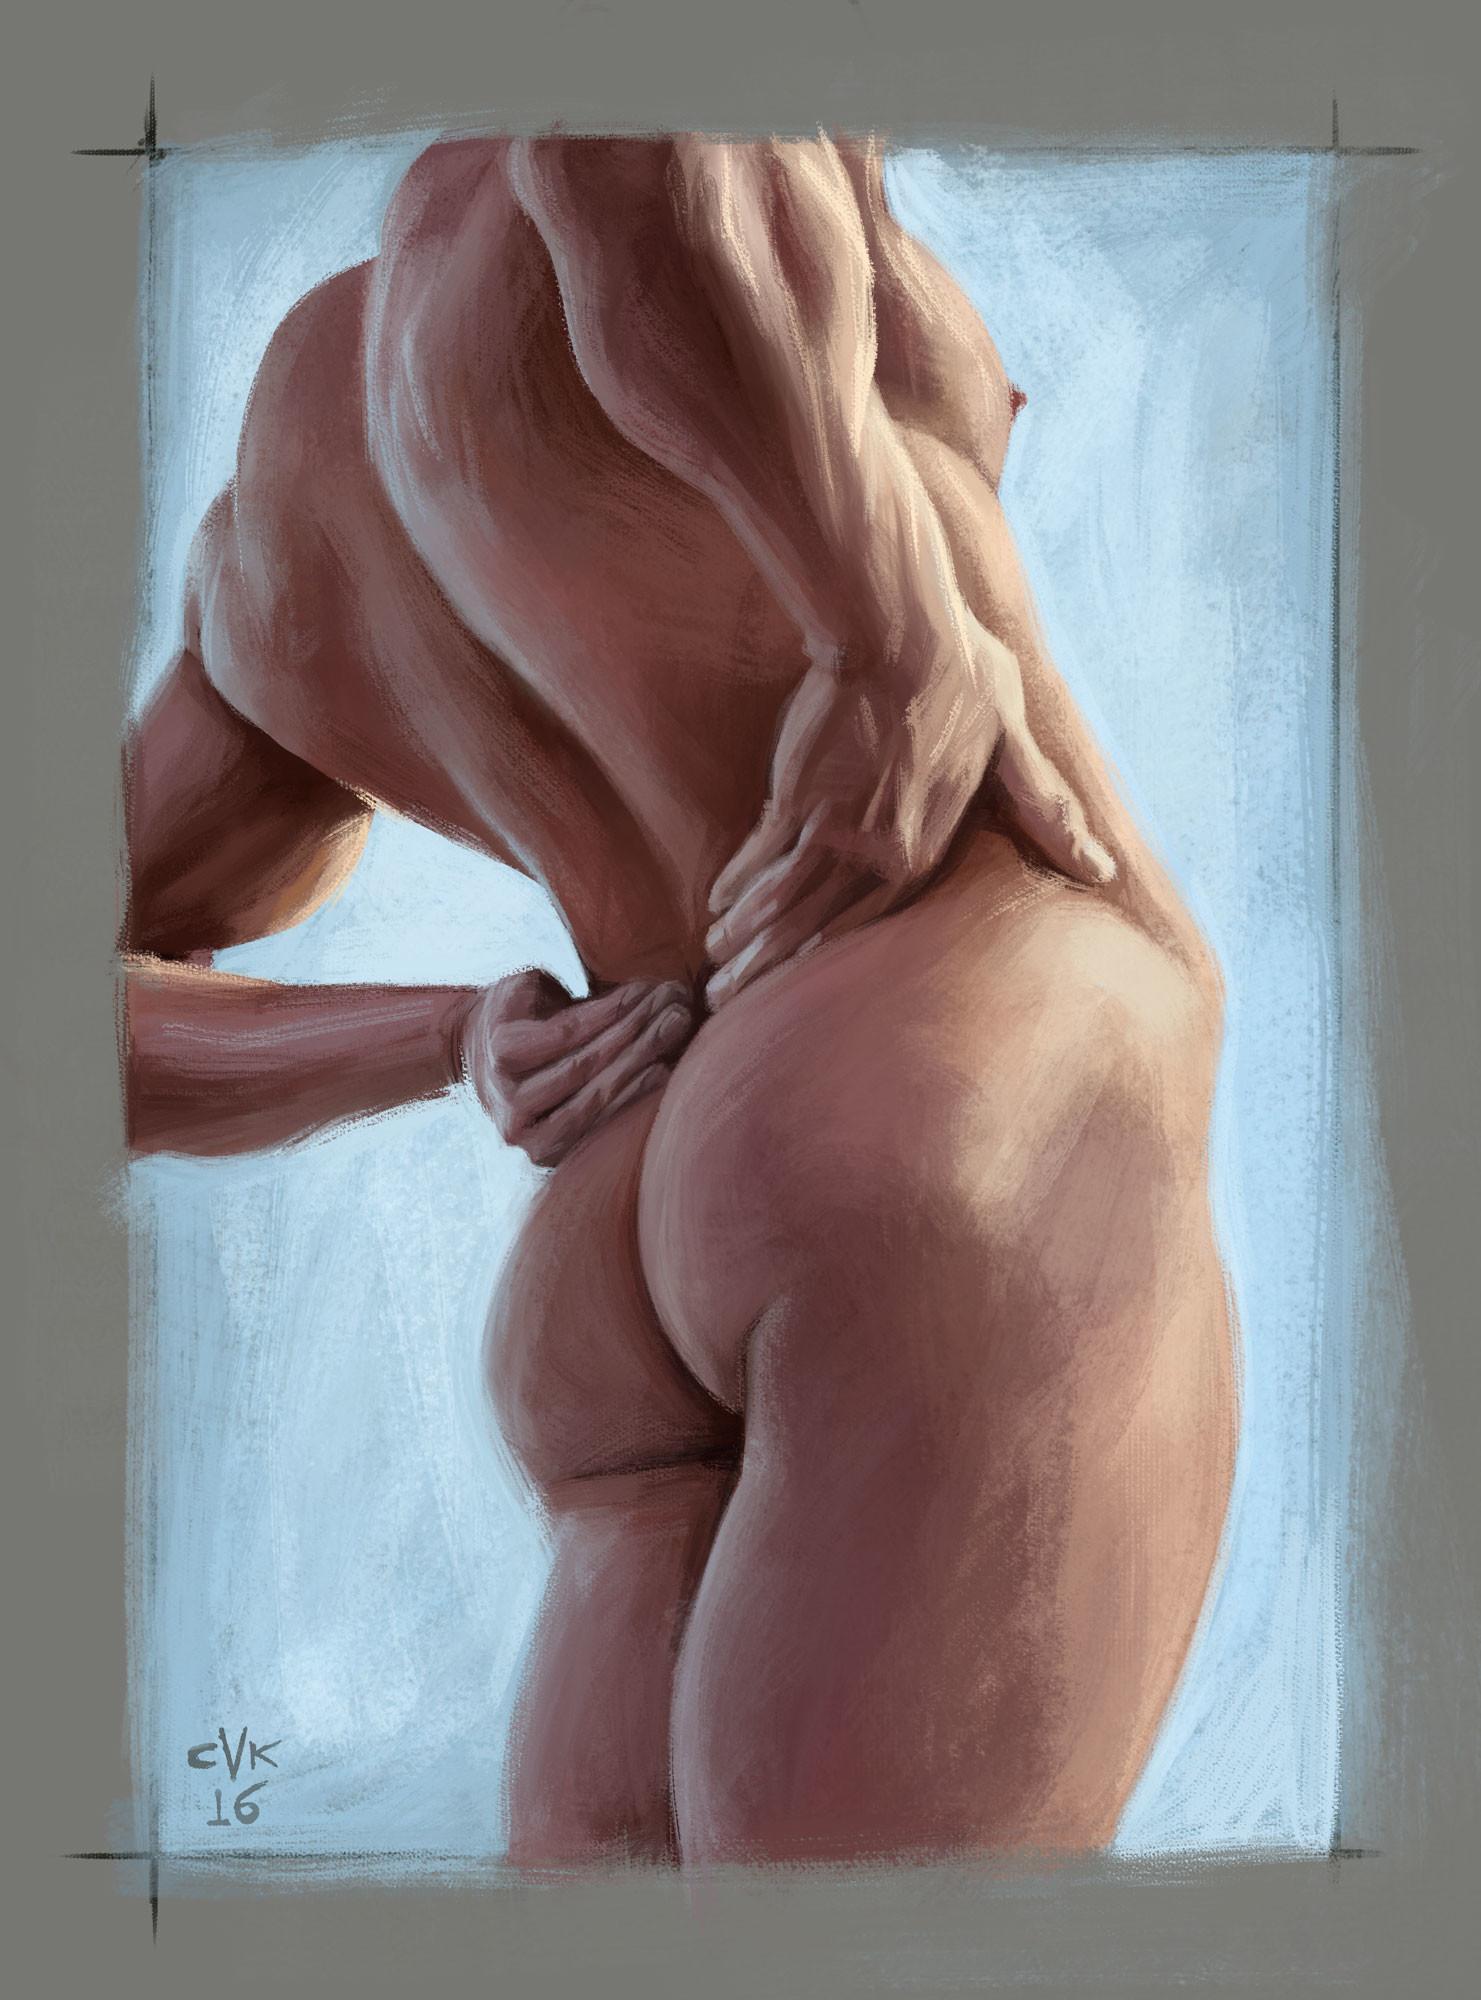 Male Figure. Digital.